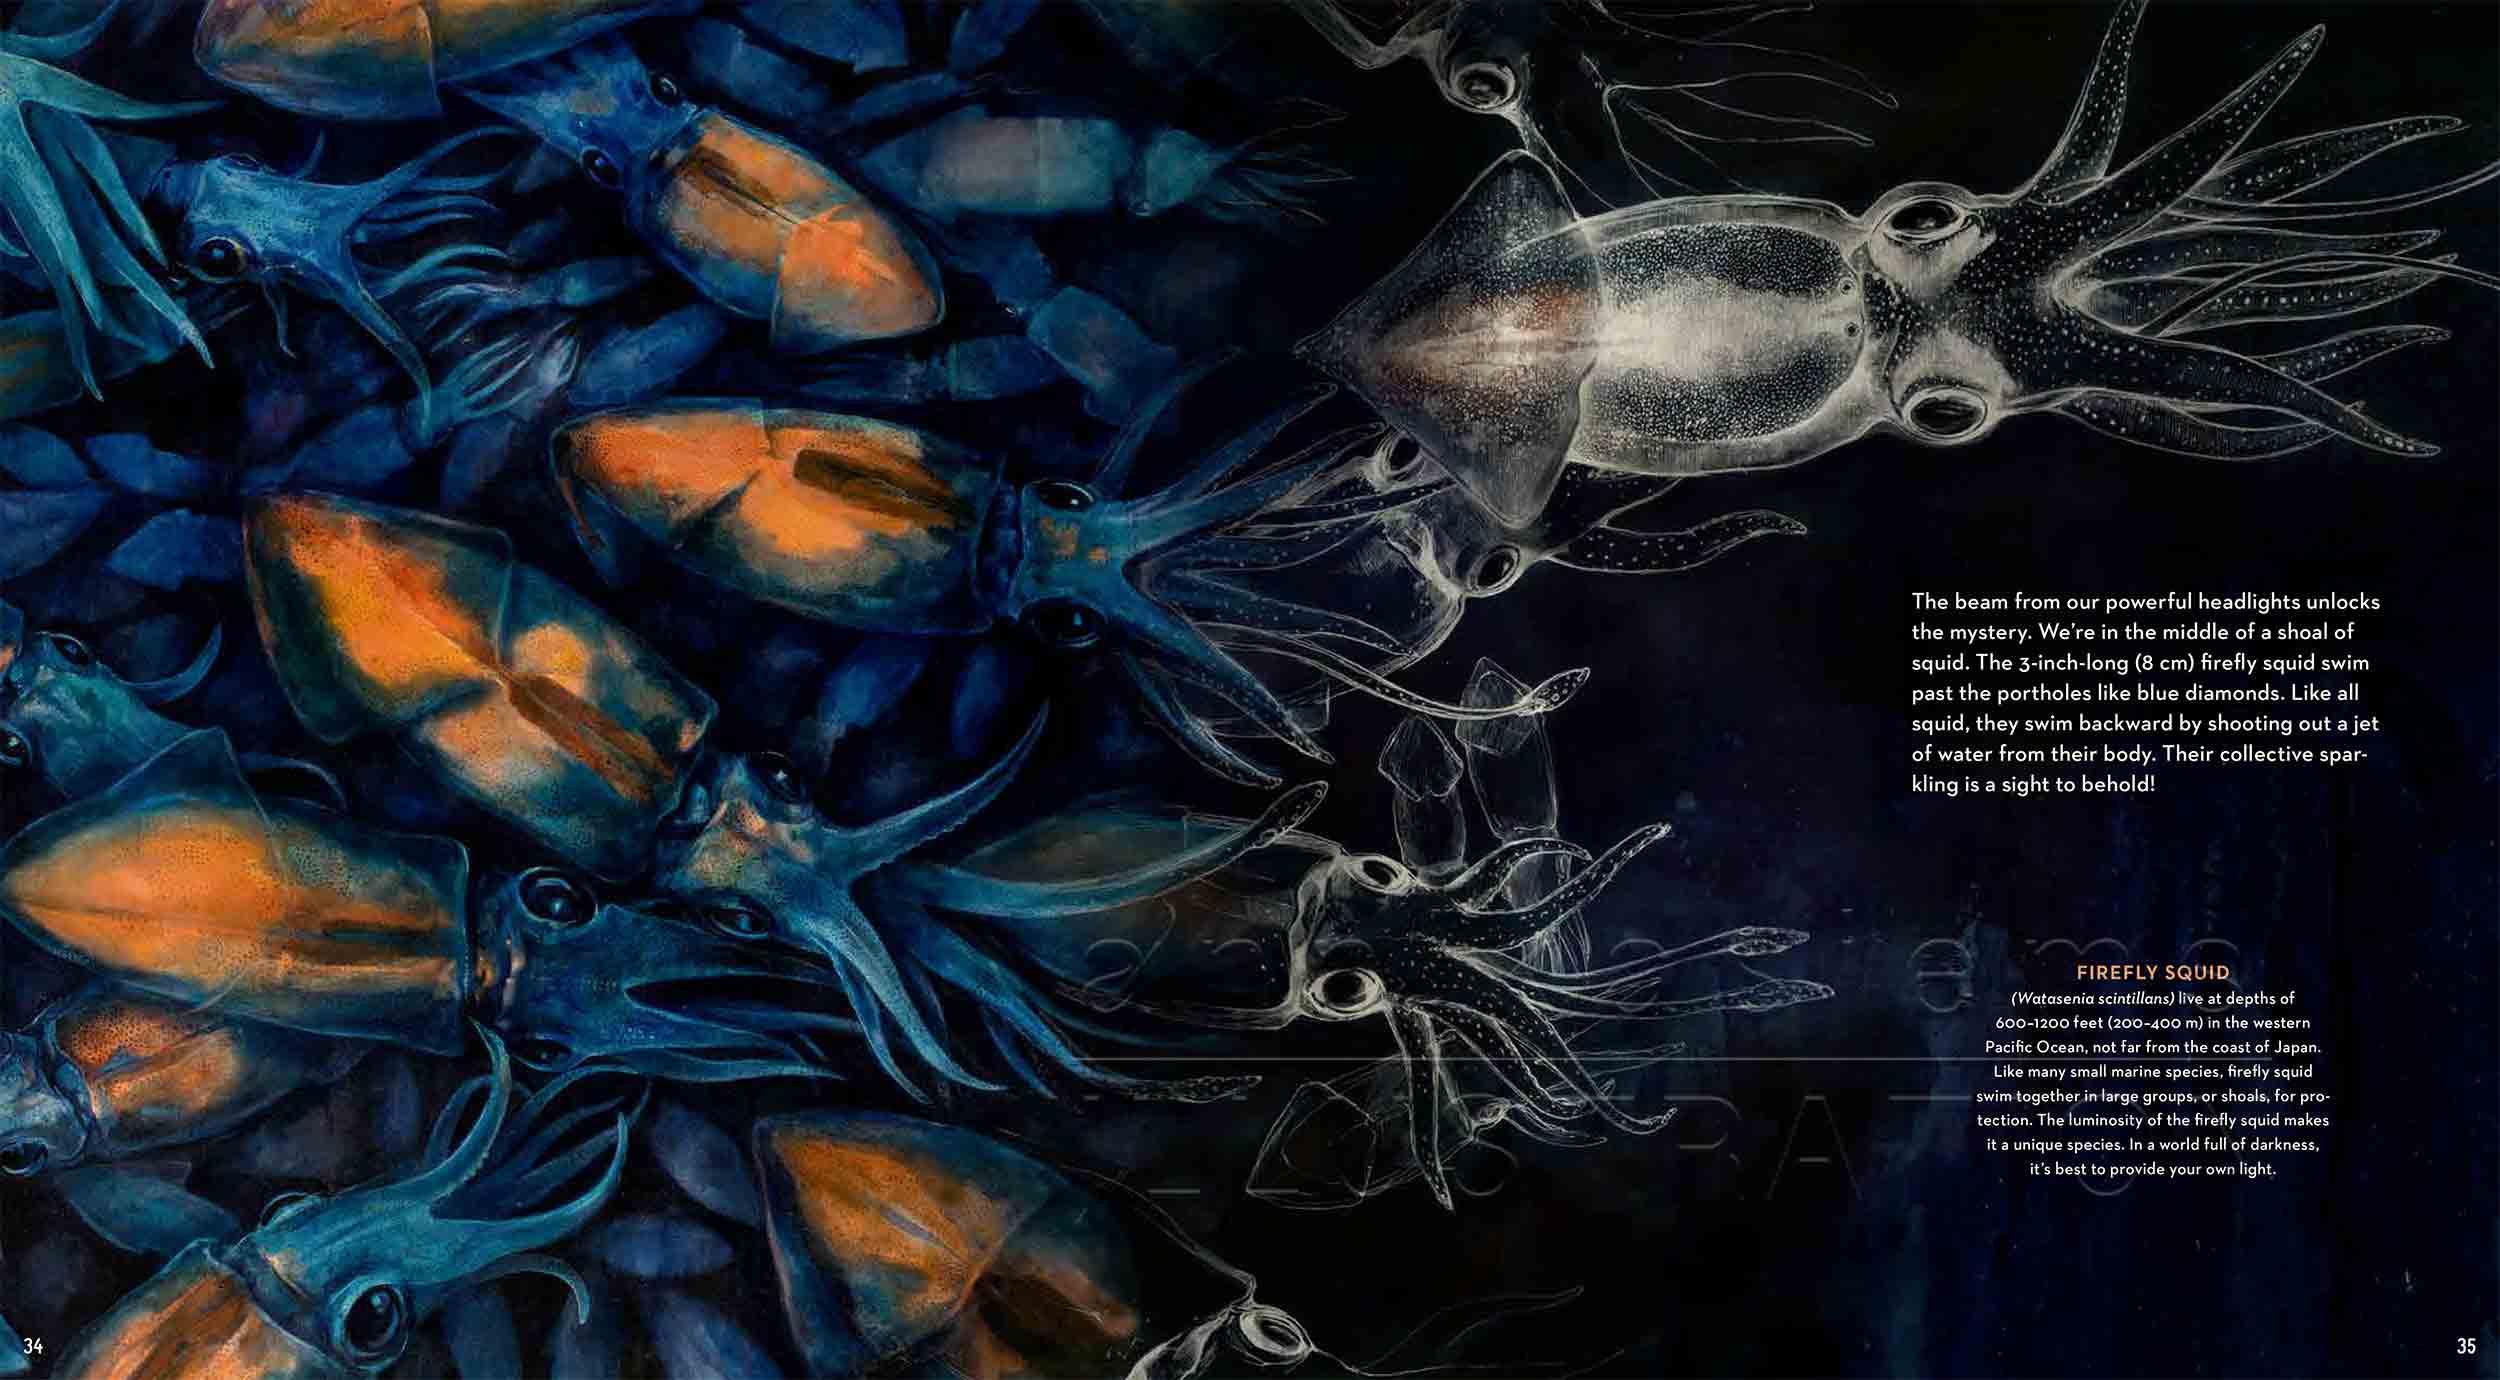 34-35-Leuchtkalmar-fireflysquidfish-fish-deep-sea-Englisch-submersible-©annikasiems-plankton_deepsea-zooplankton.jpg